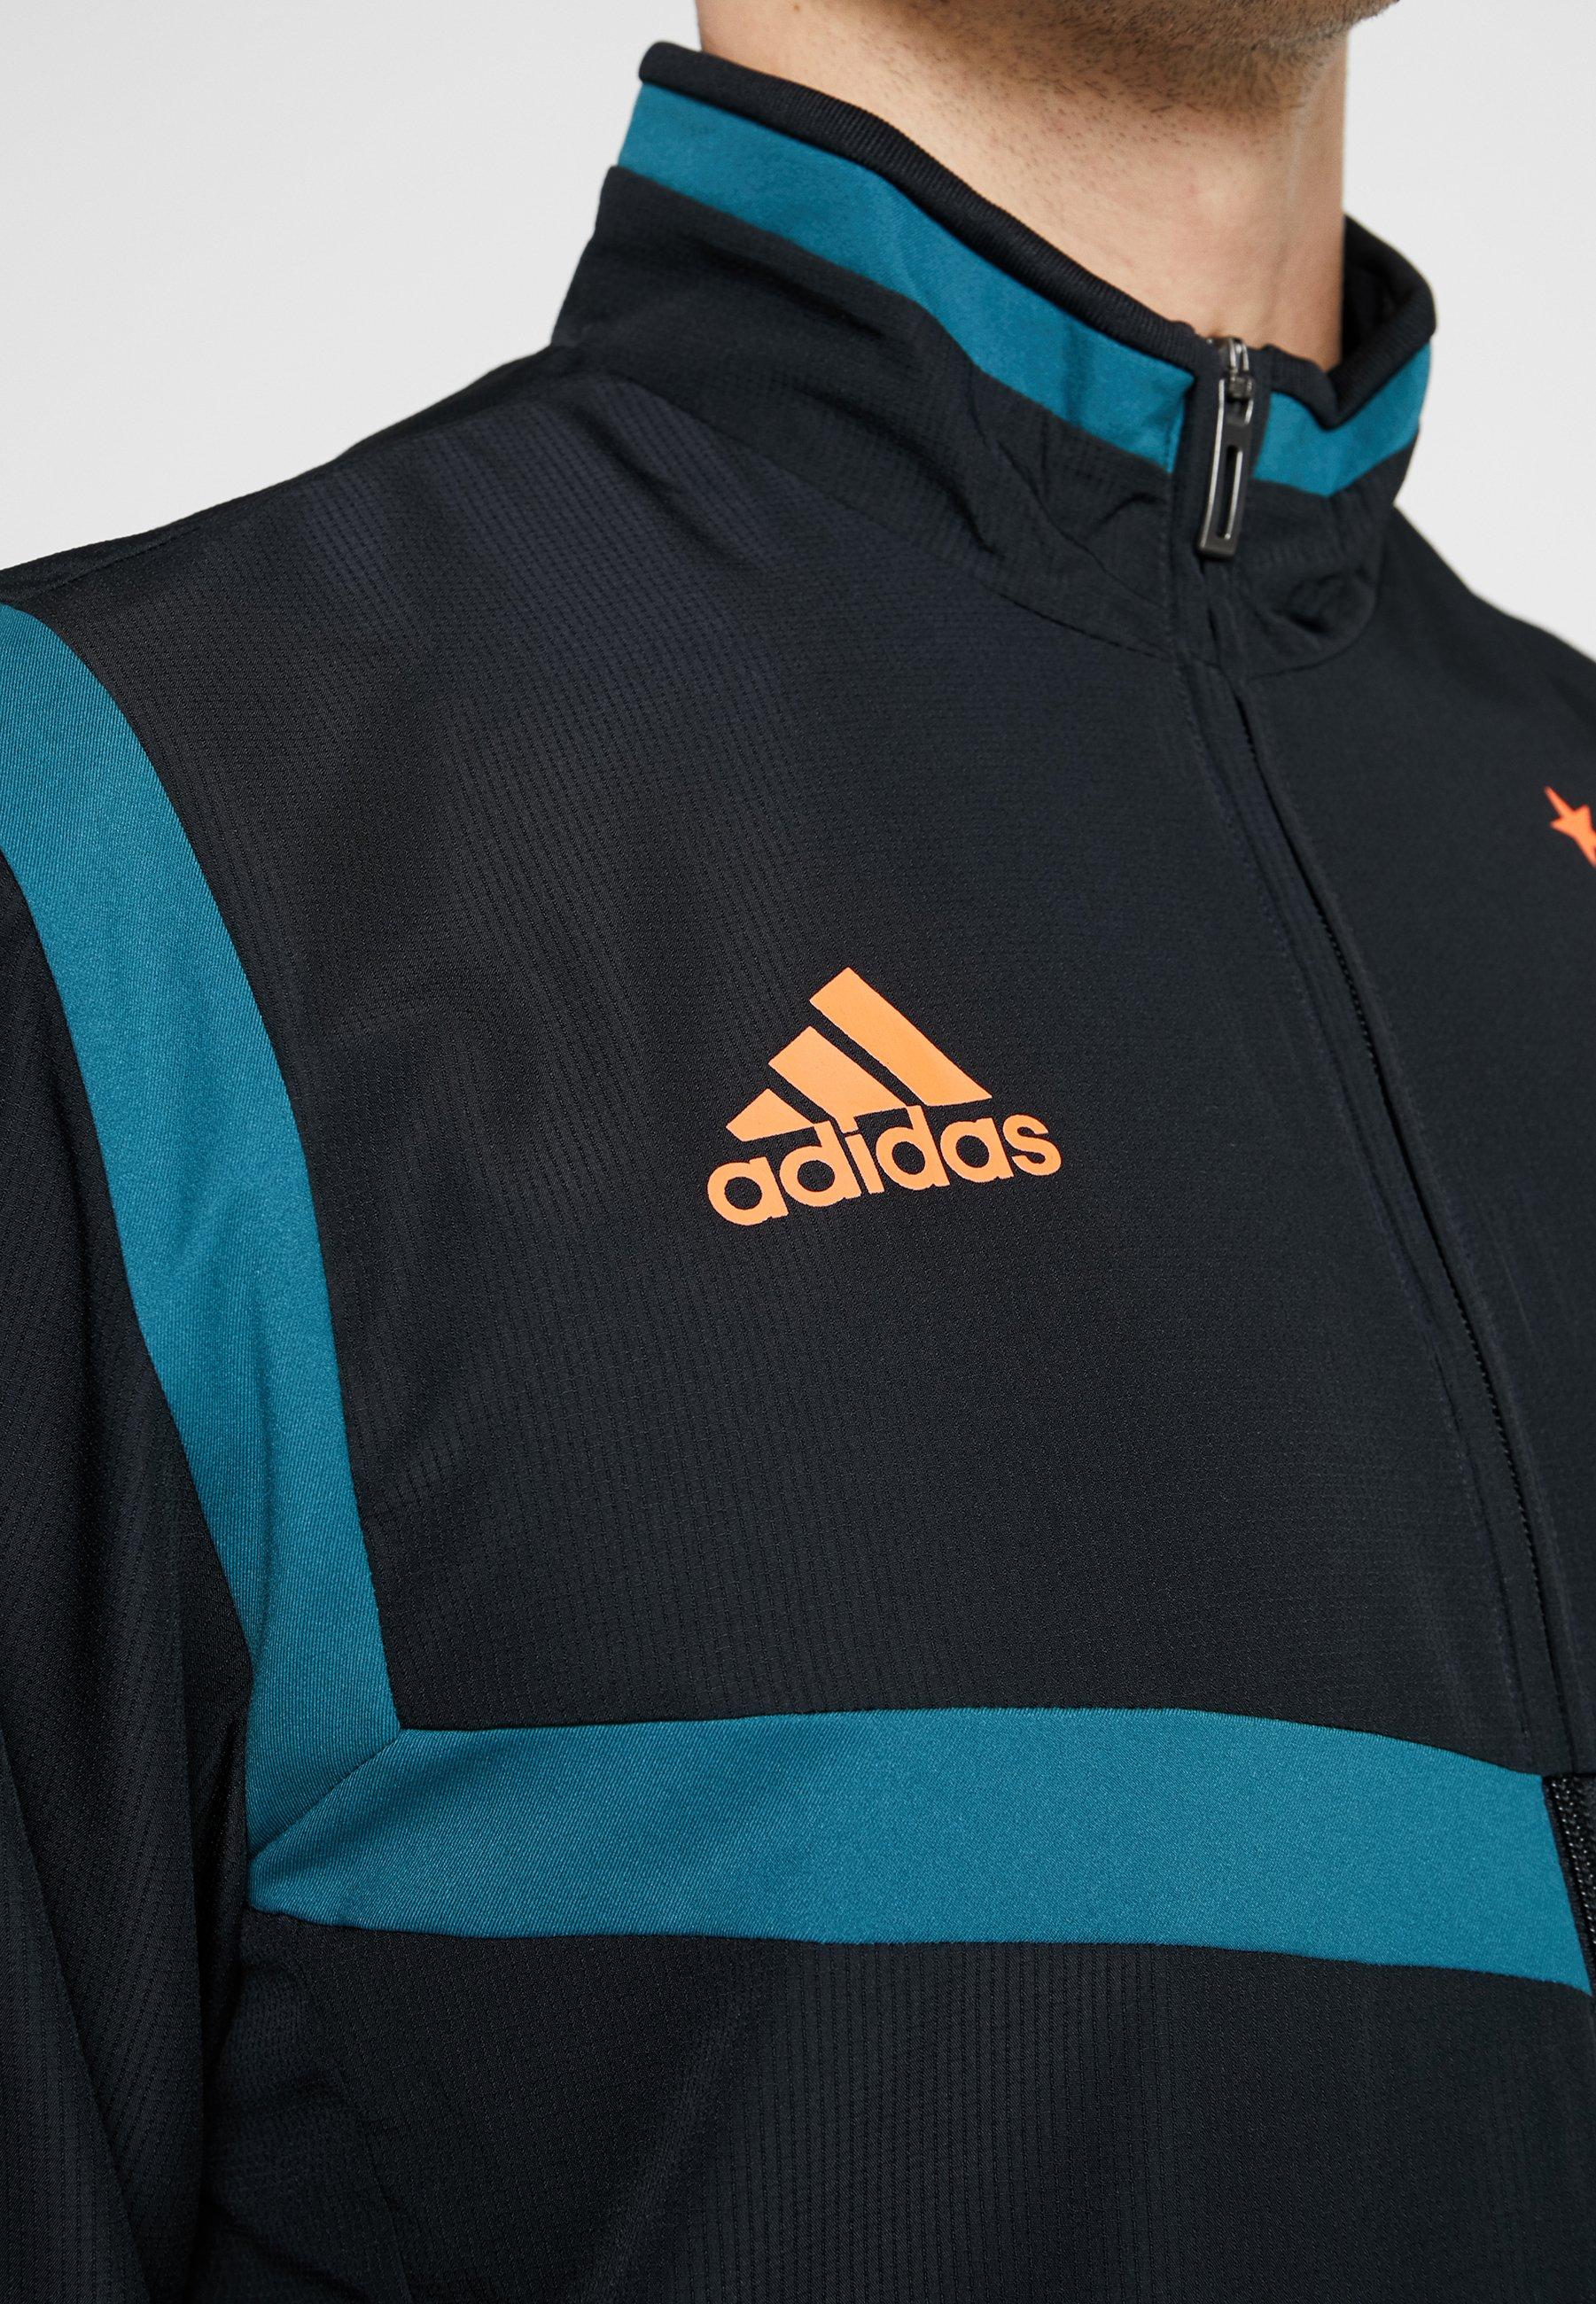 Performance Adidas Black Green Supporter tech AjaxArticle De FK1TlJc